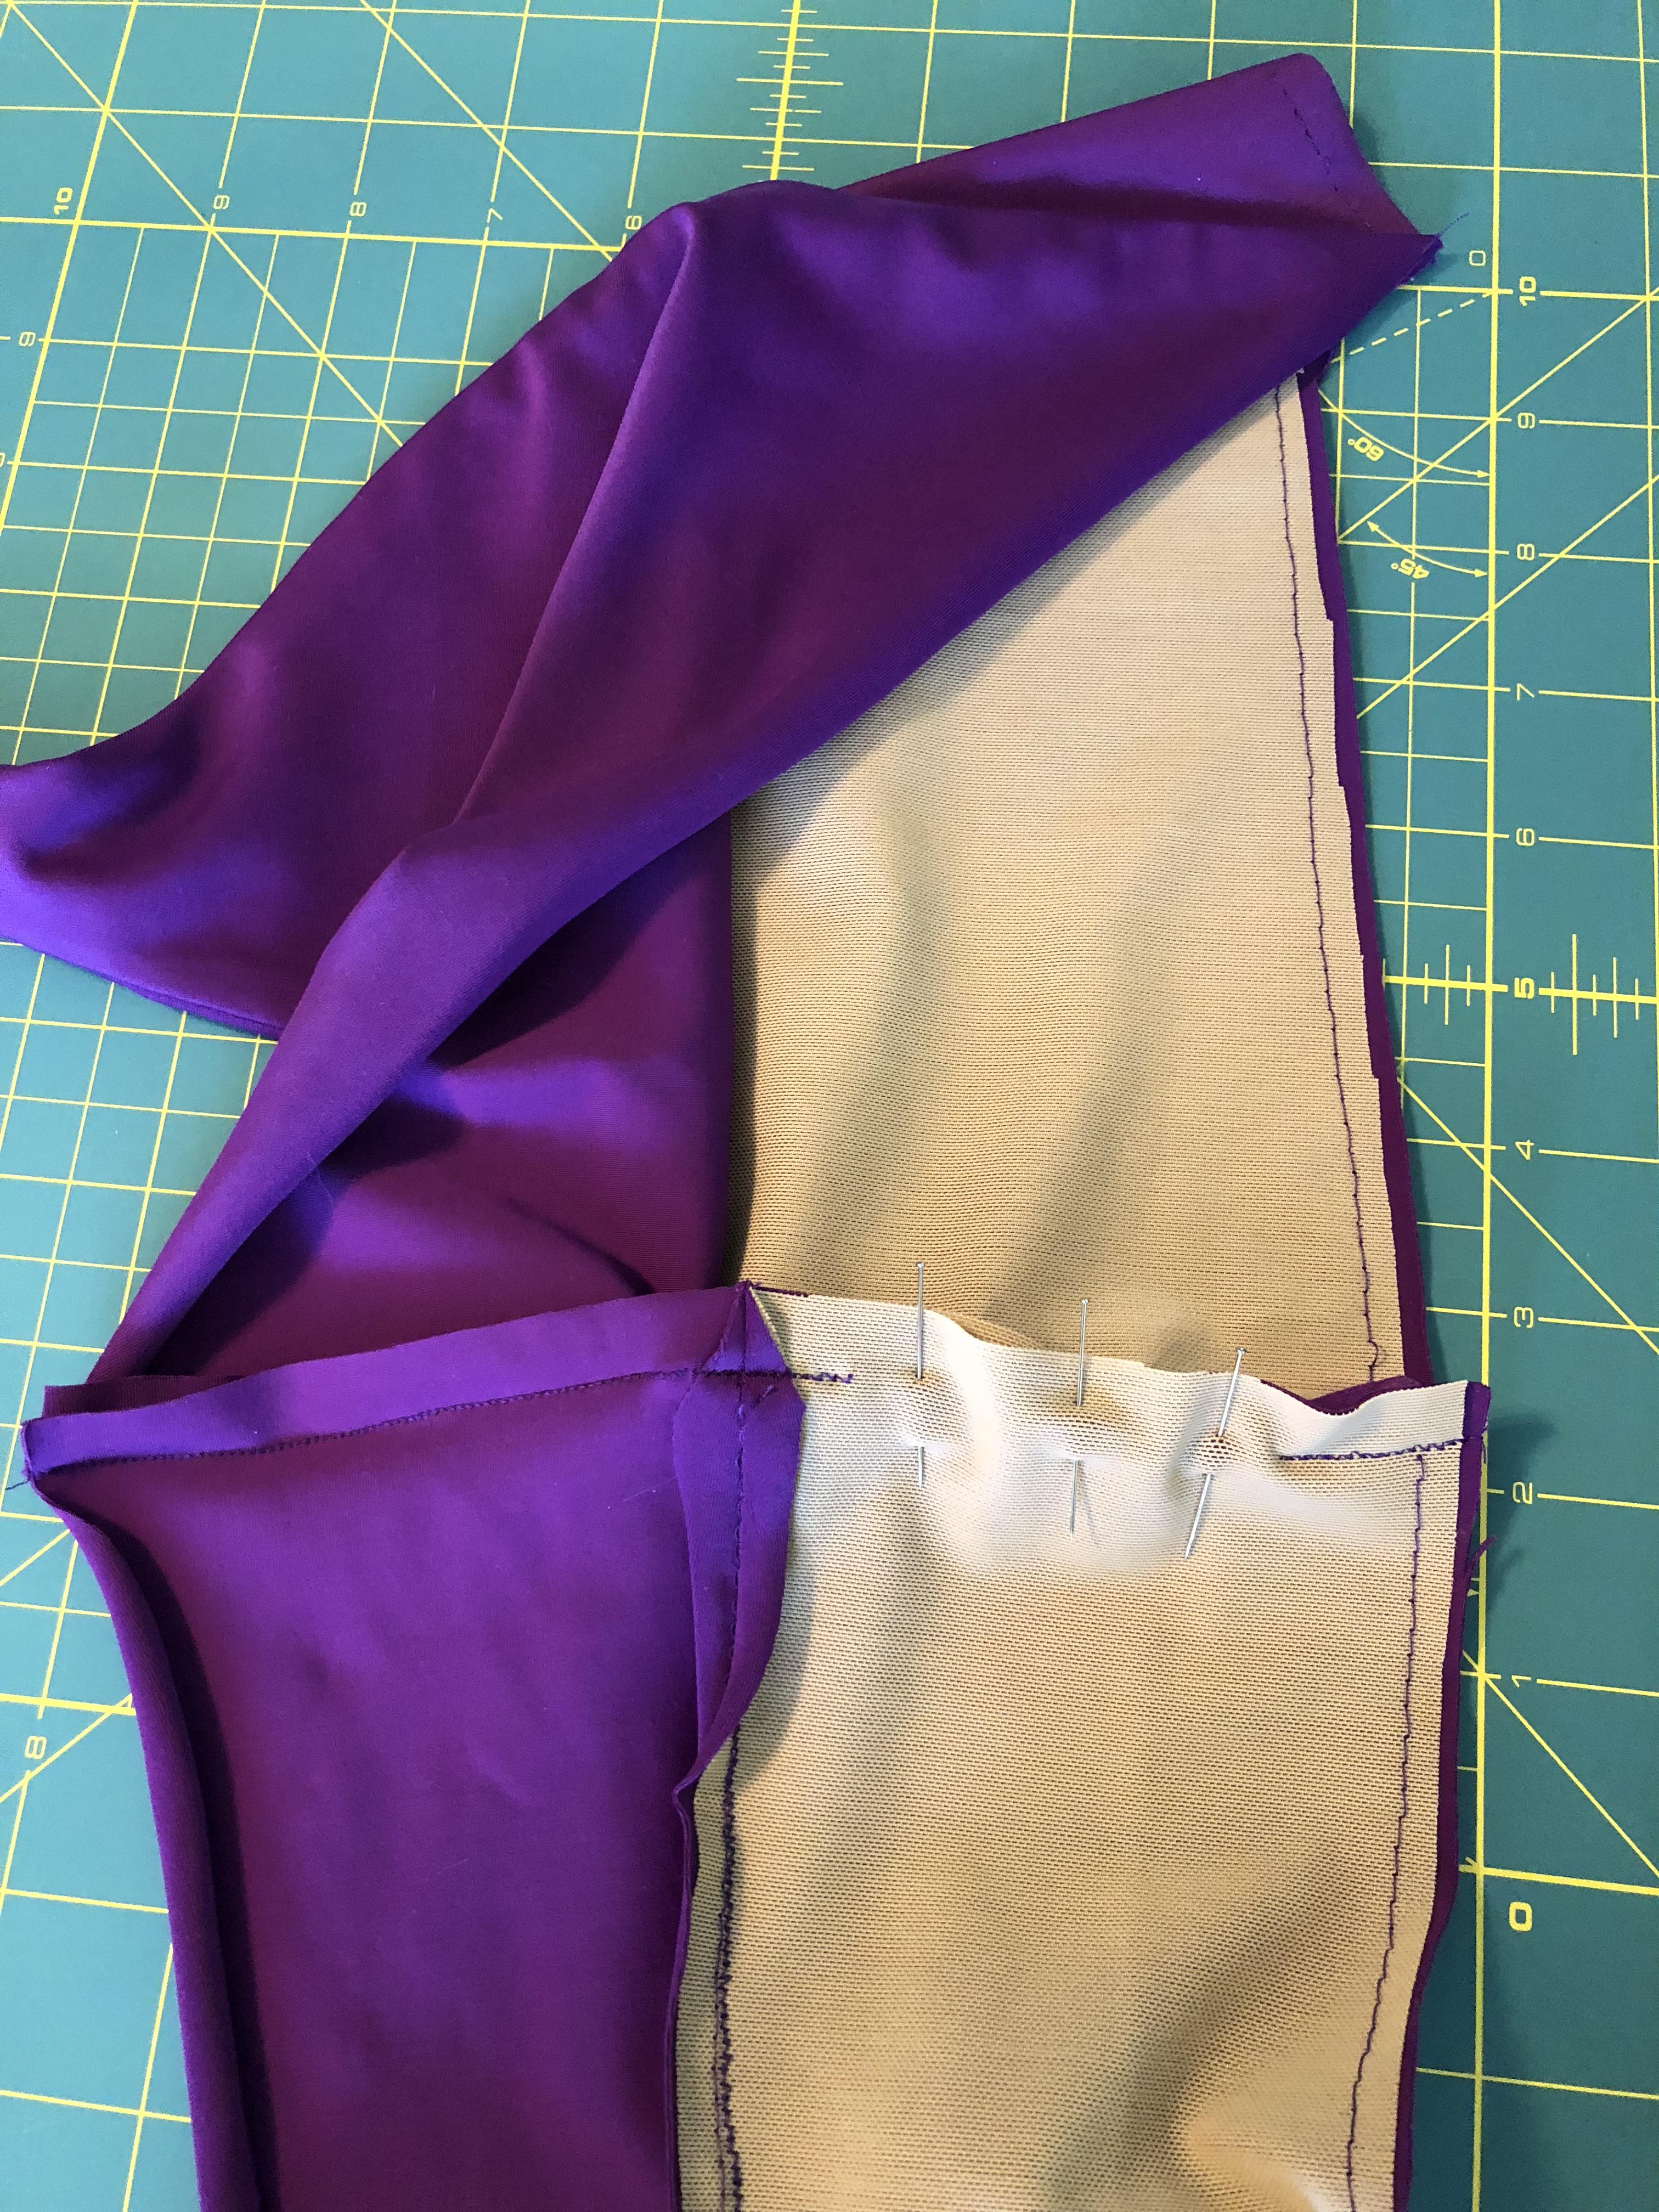 side seam sewn pinned